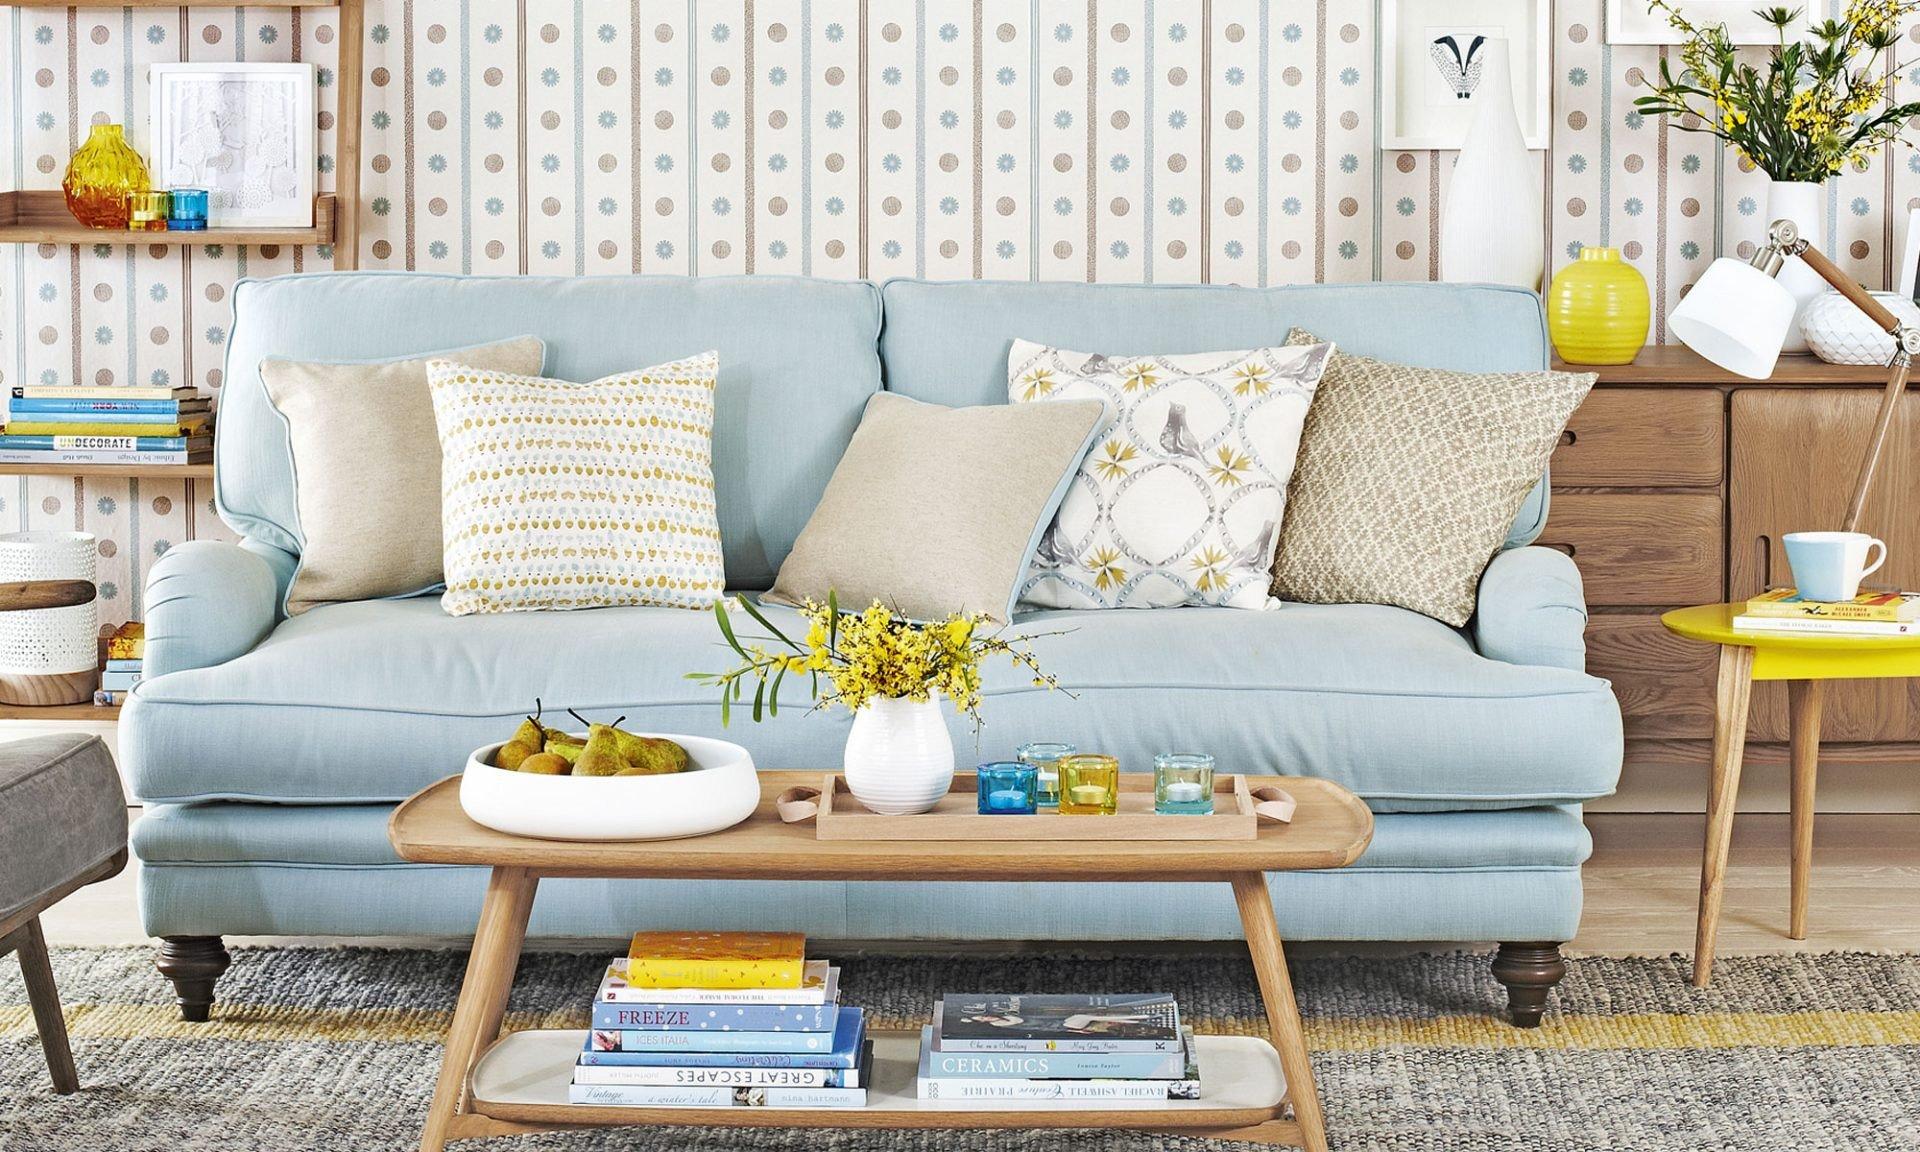 Living Room Design for Summer Luxury Summer Living Room Ideas